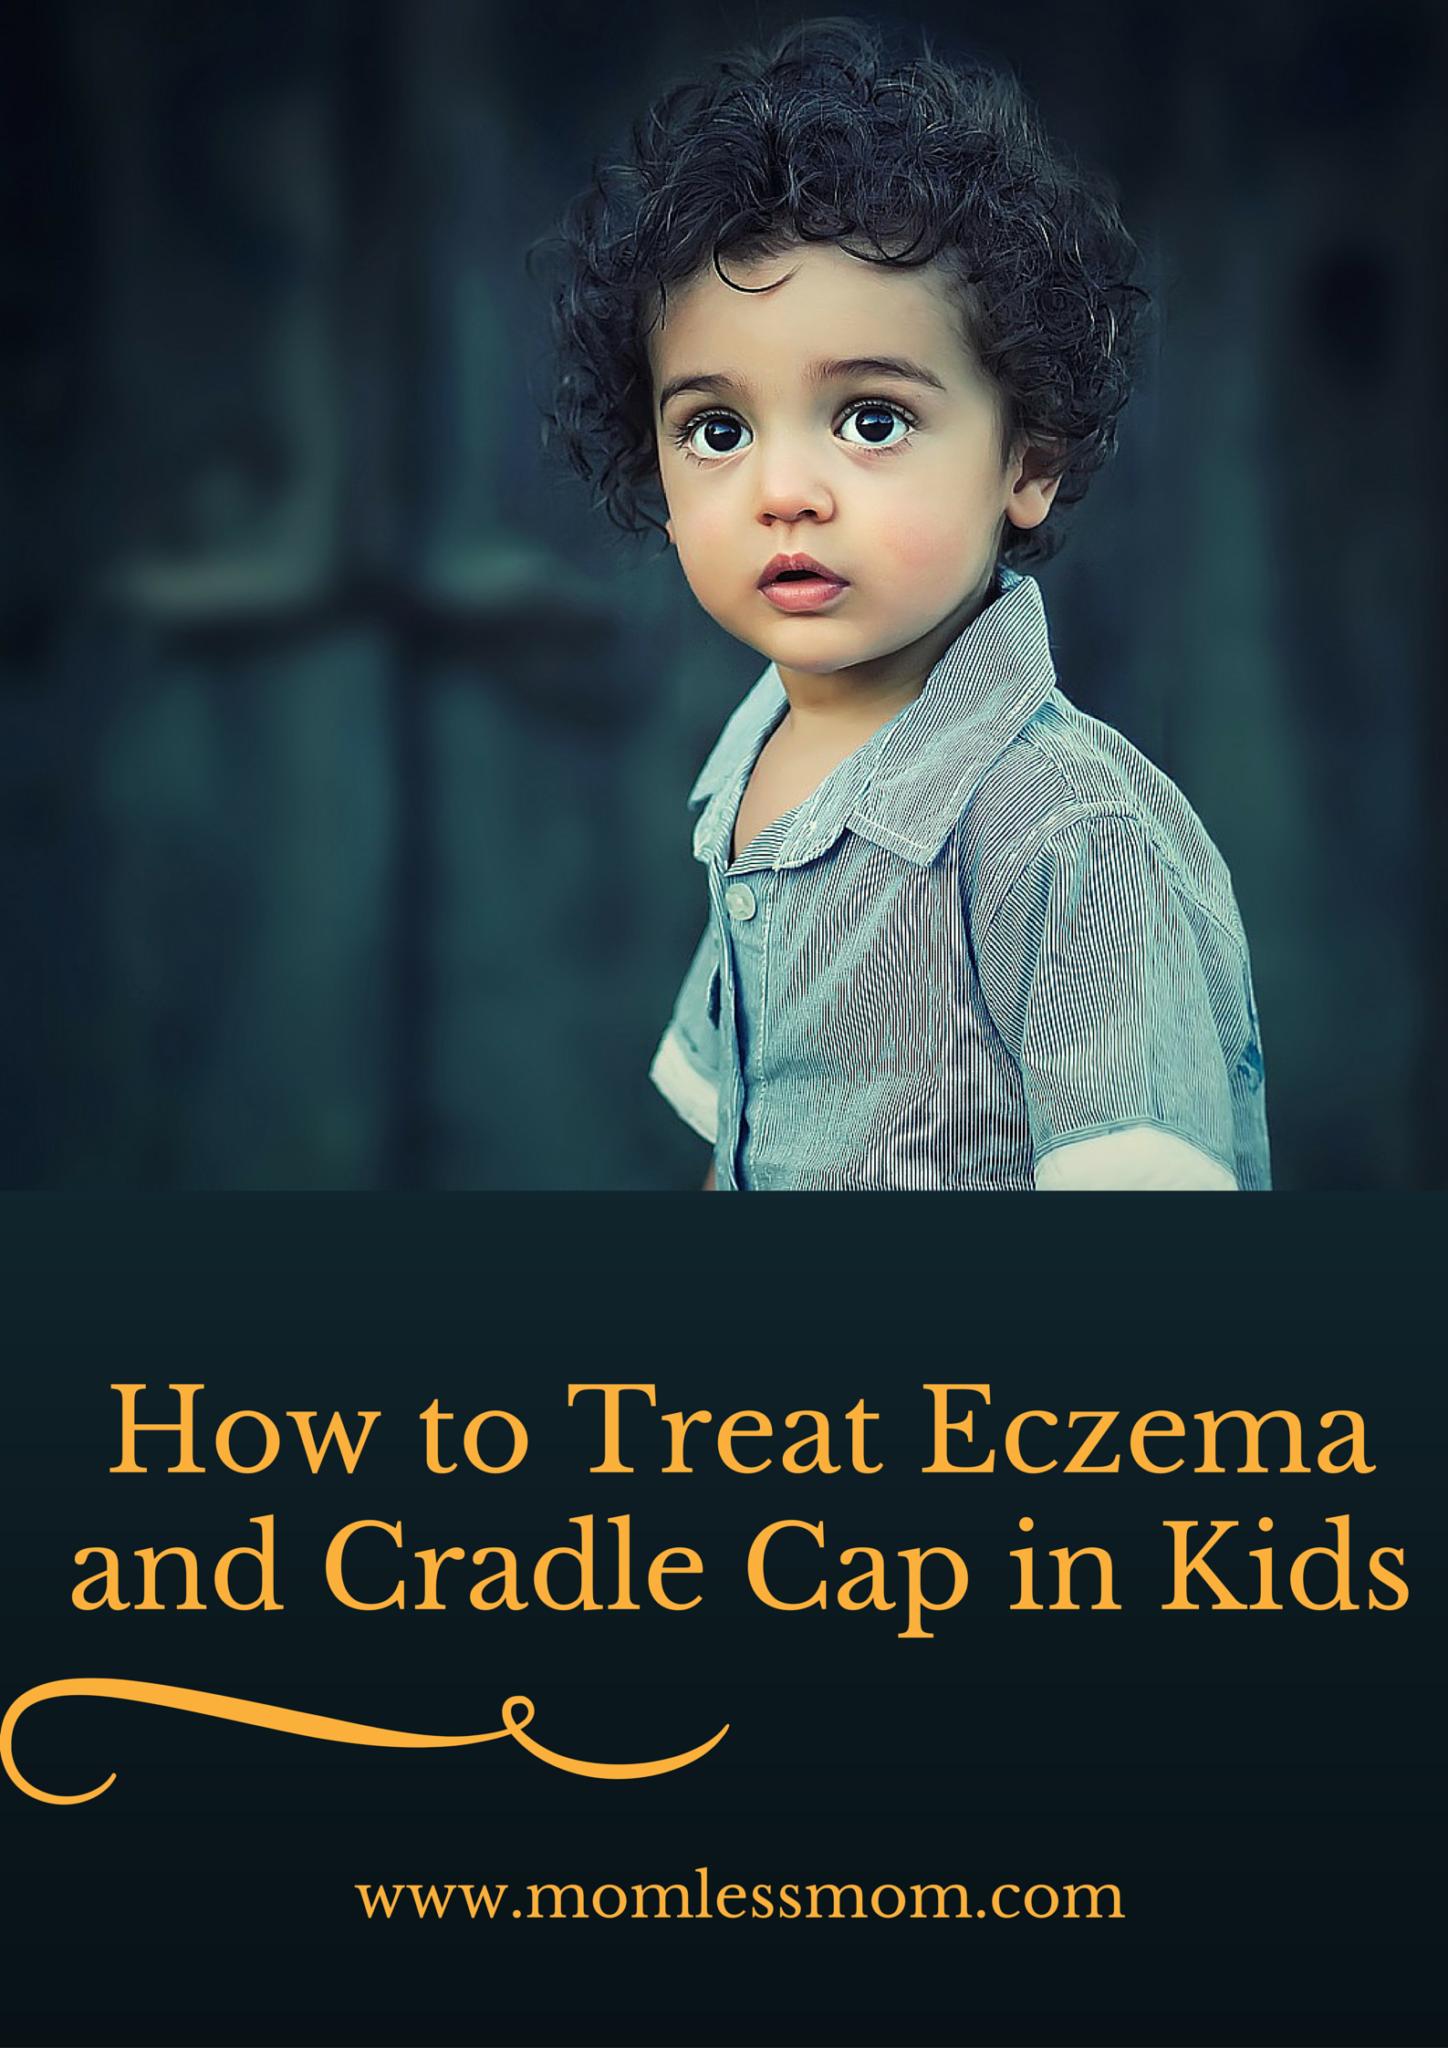 How to Treat Eczema and Cradle Cap in Kids